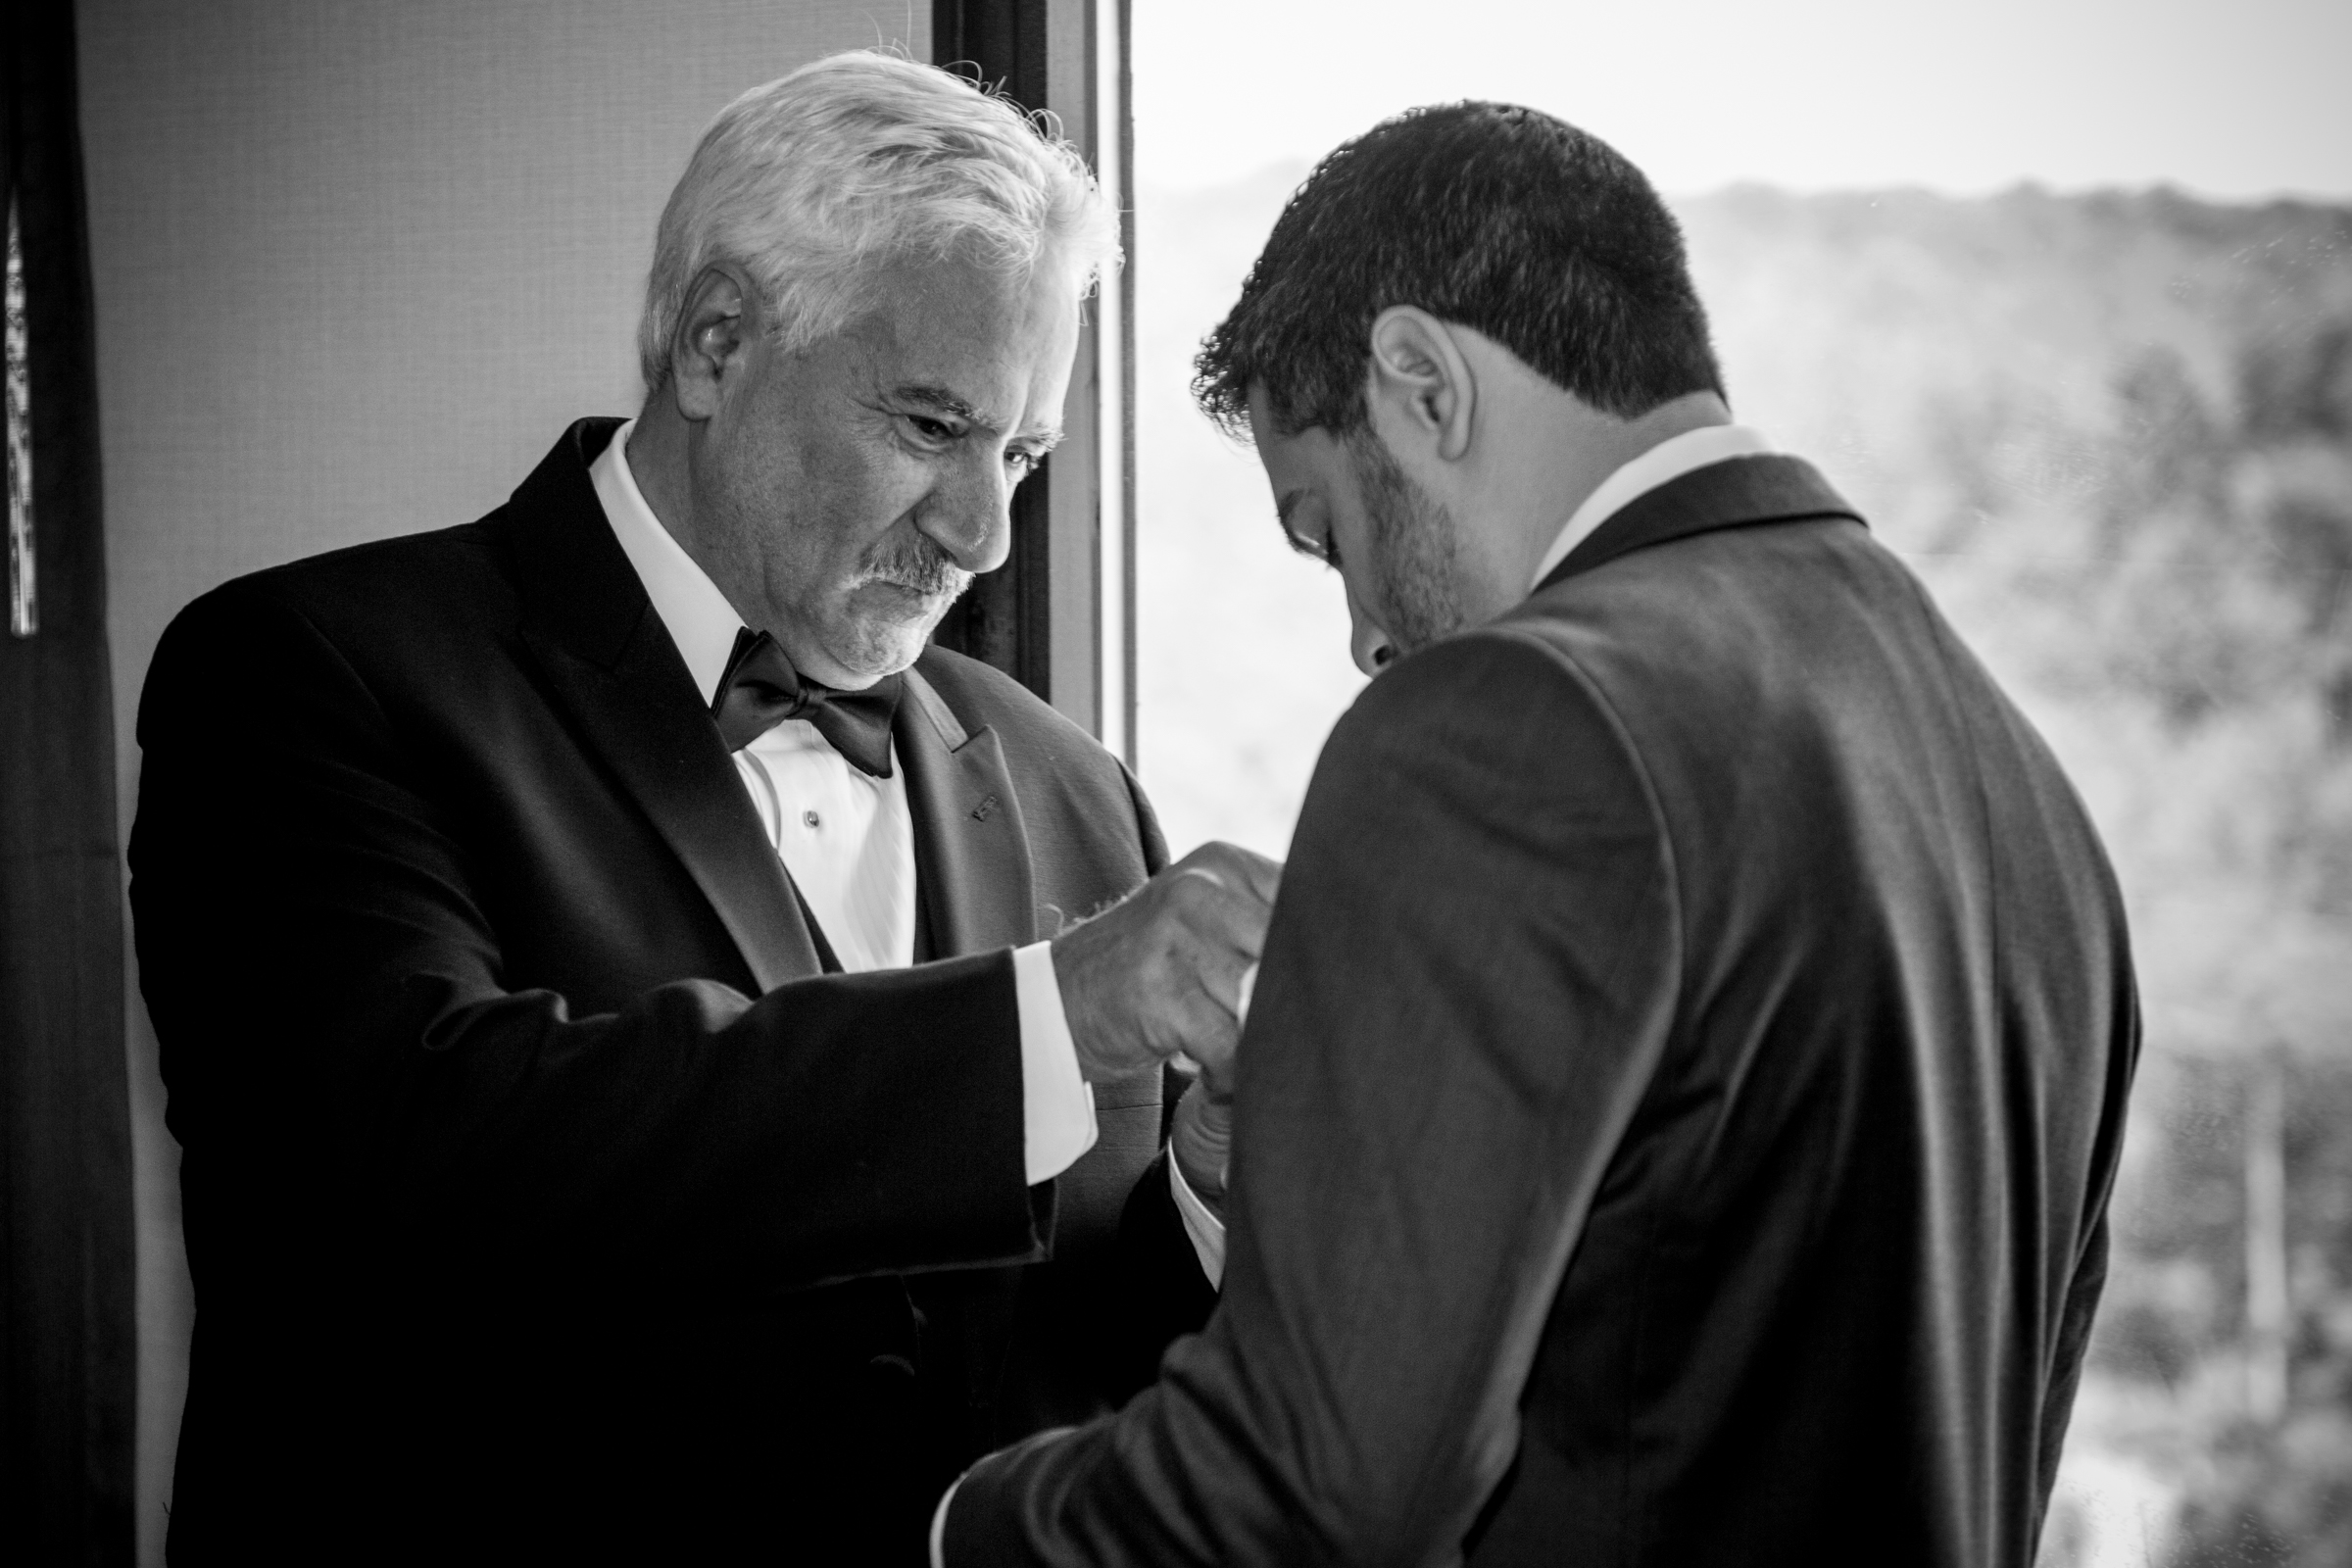 trump-national-golf-course-groom-wedding-photos